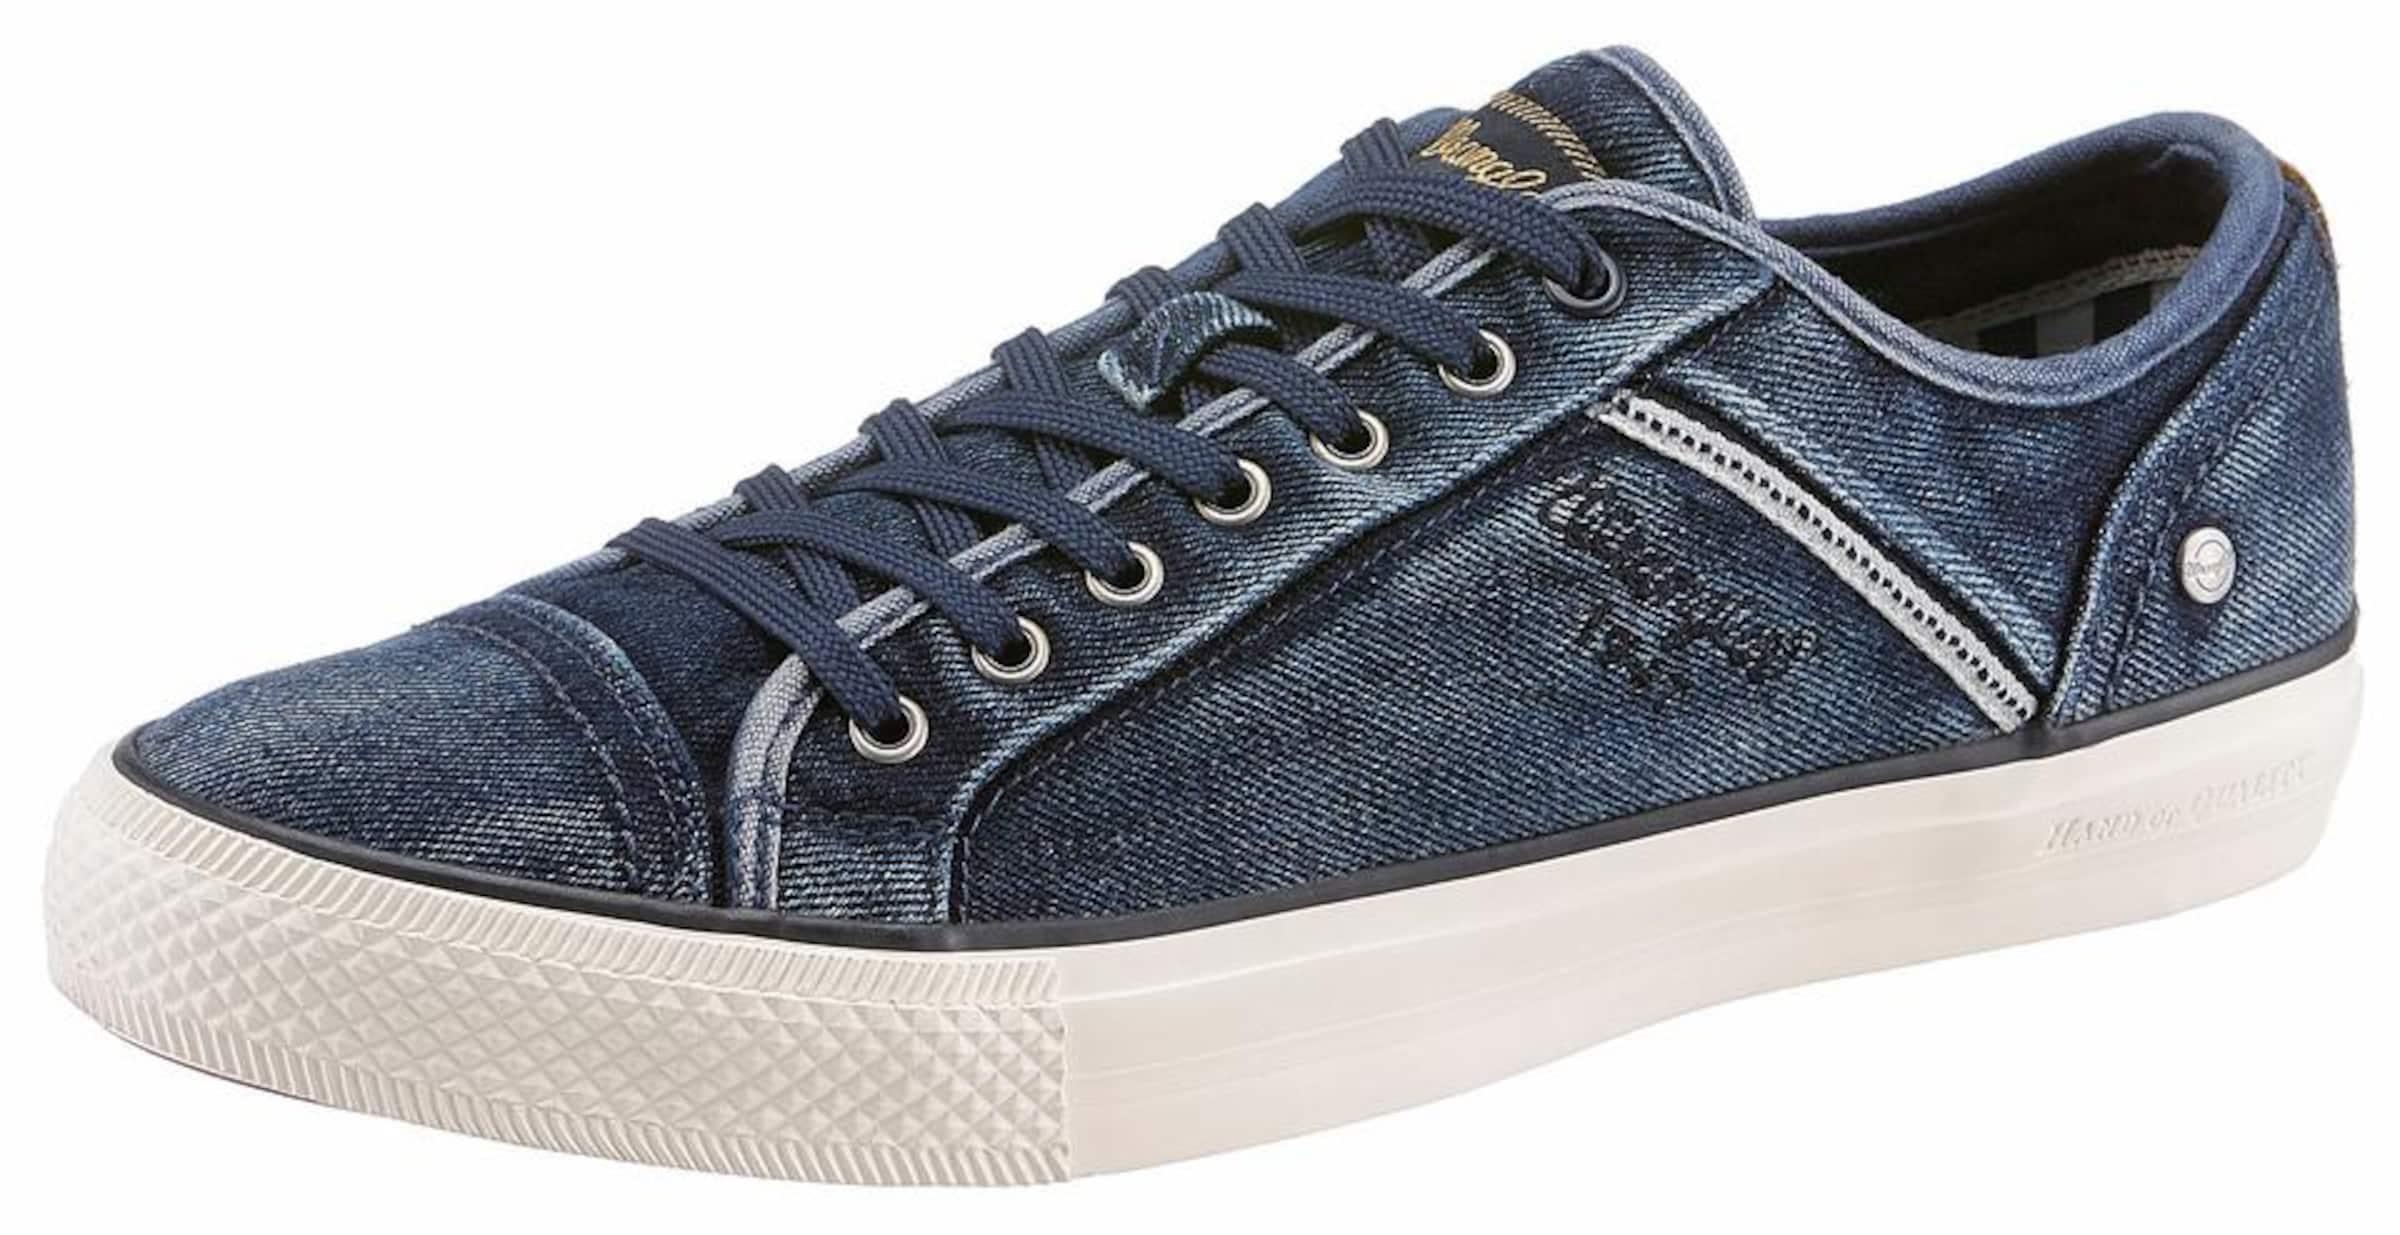 WRANGLER Sneaker Starry Low Denim Hohe Qualität